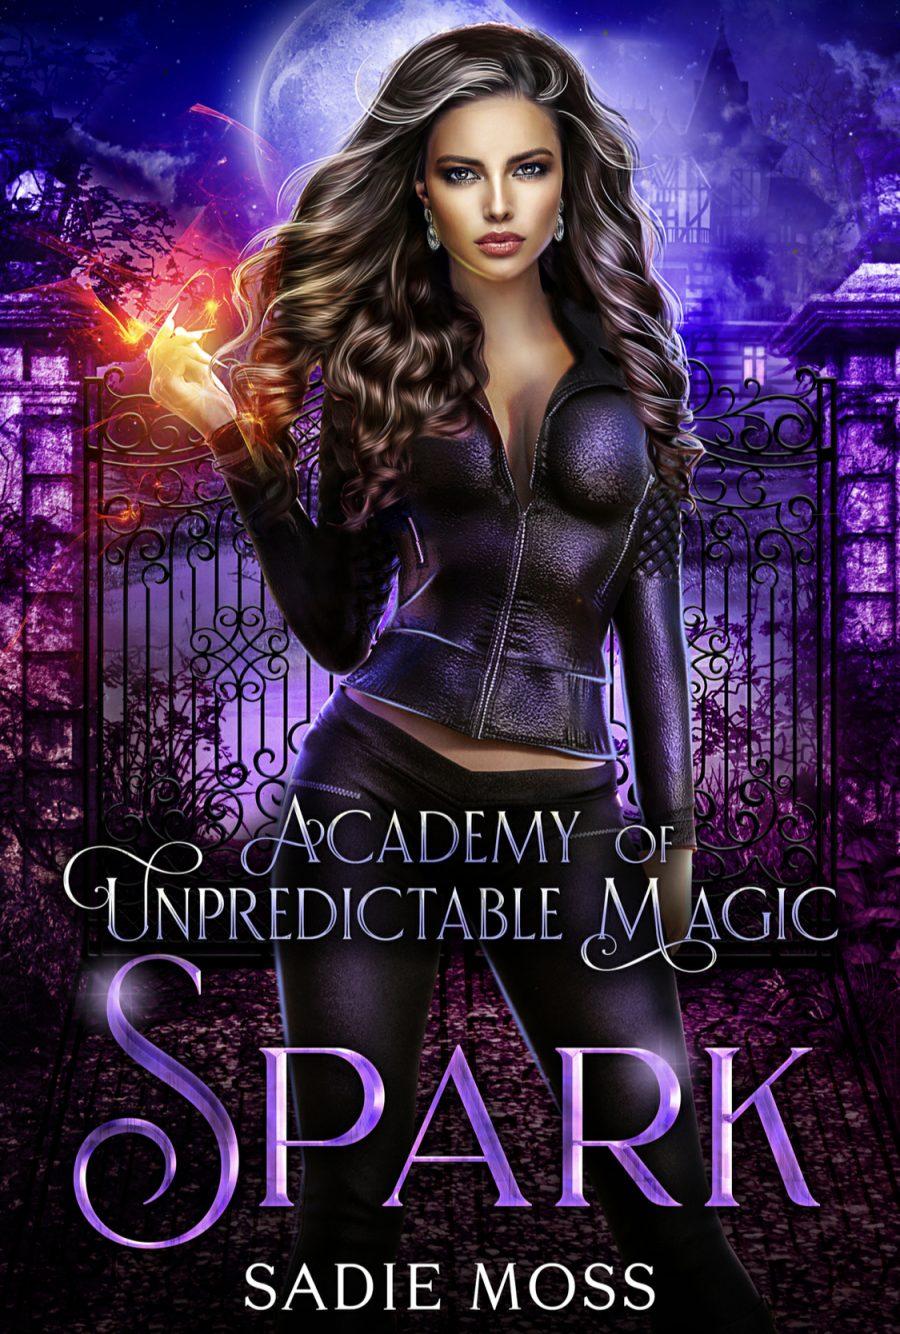 Spark by Sadie Moss - A Book Review #BookReview #MediumBurn #PNR #Academy #ReverseHarem #RH #WhyChoose #NewSeries